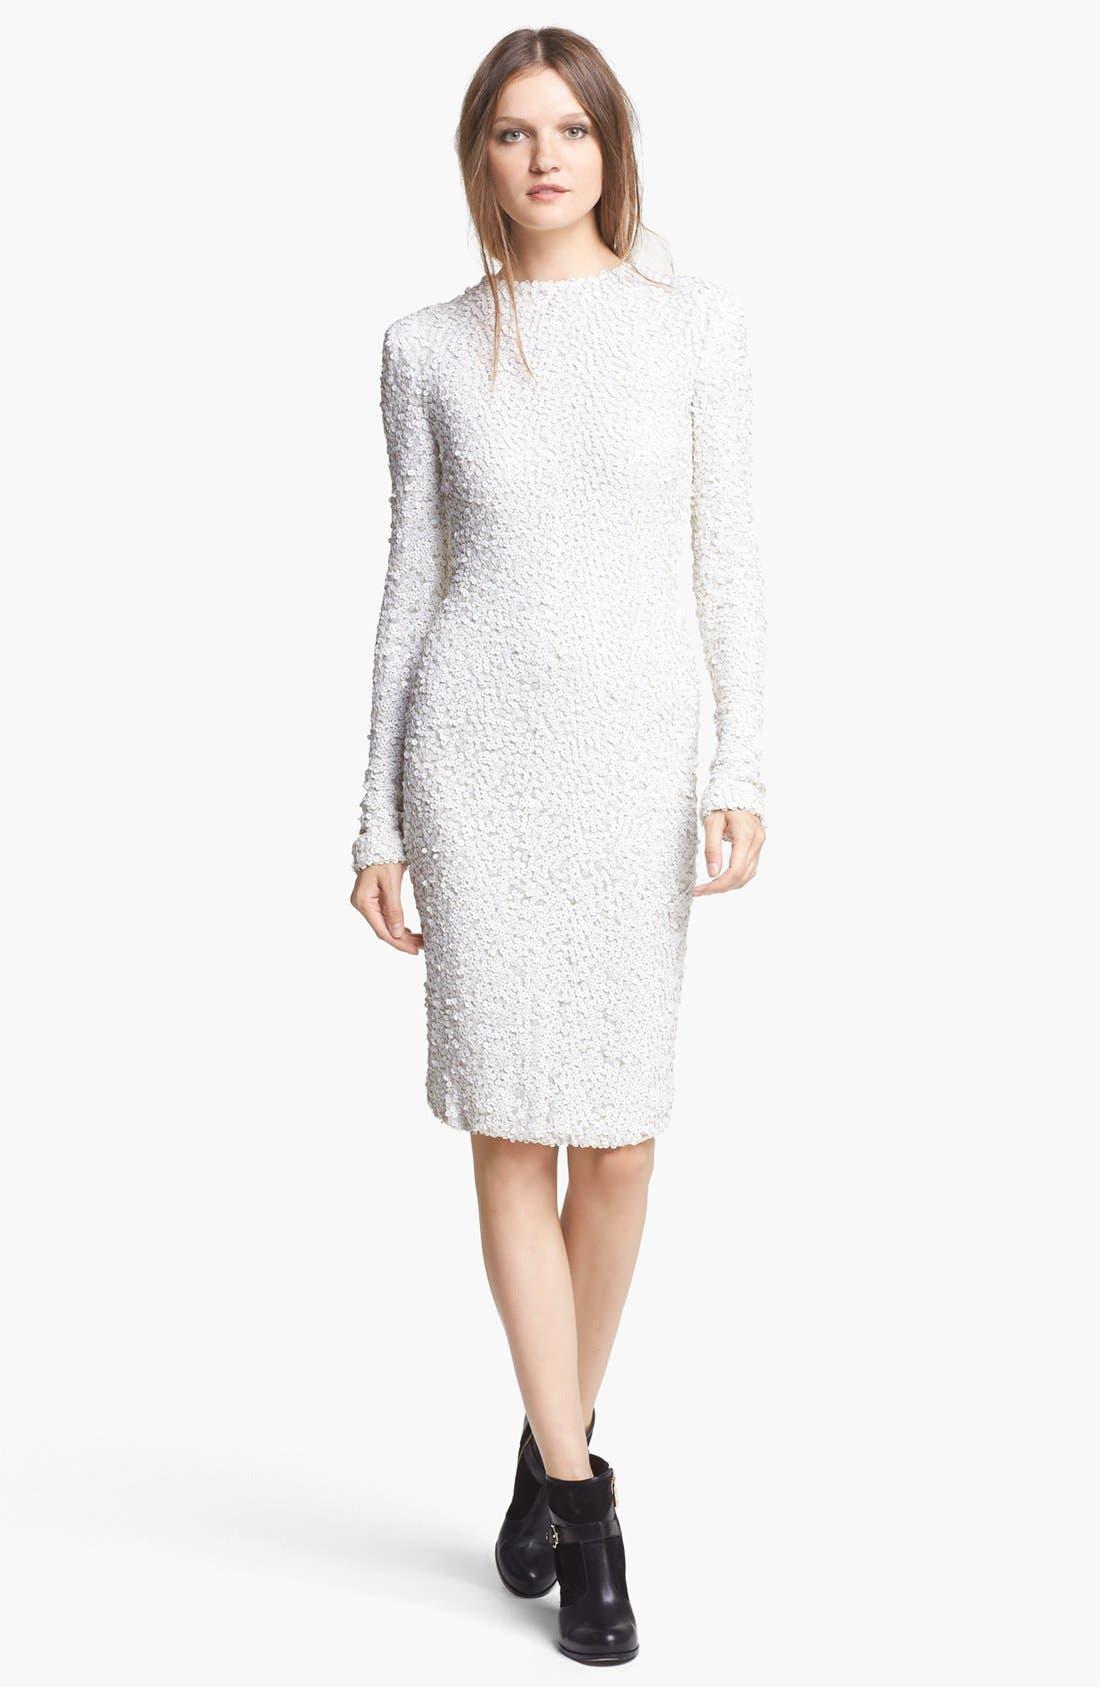 Alternate Image 1 Selected - Rachel Zoe 'Adrienne' Sequin Dress